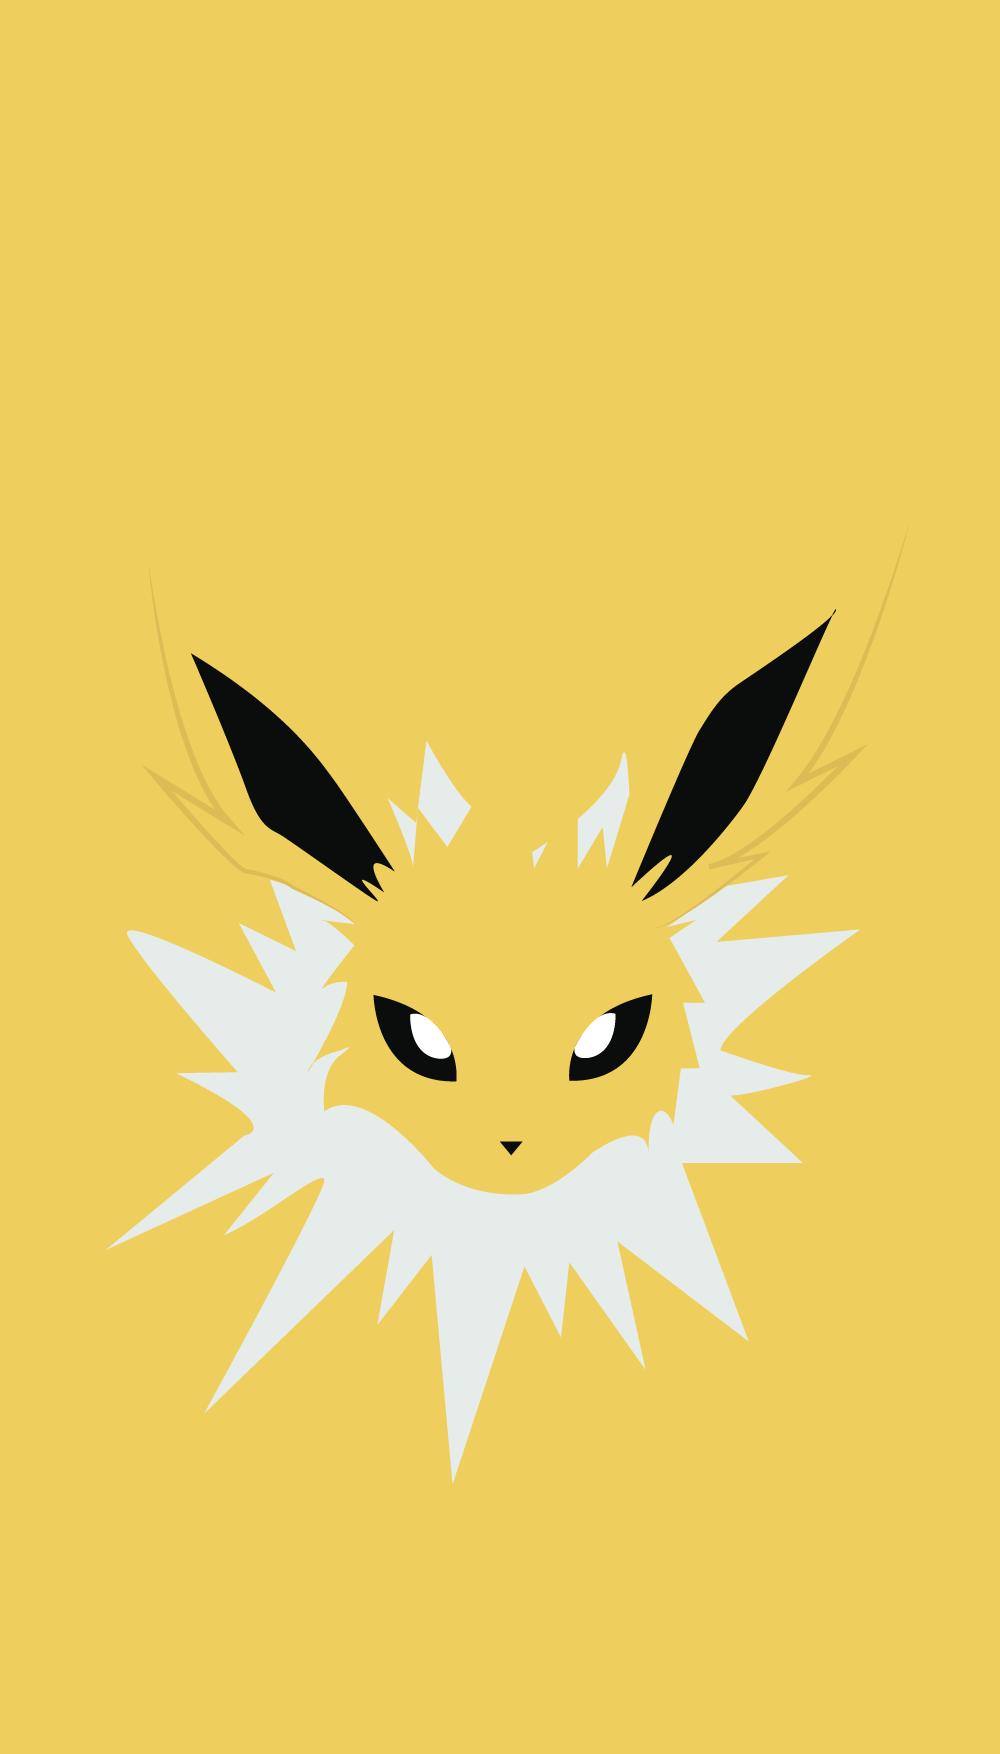 Pokemon Wallpaper Jolteon | Pokemon | Pinterest | Pokémon …